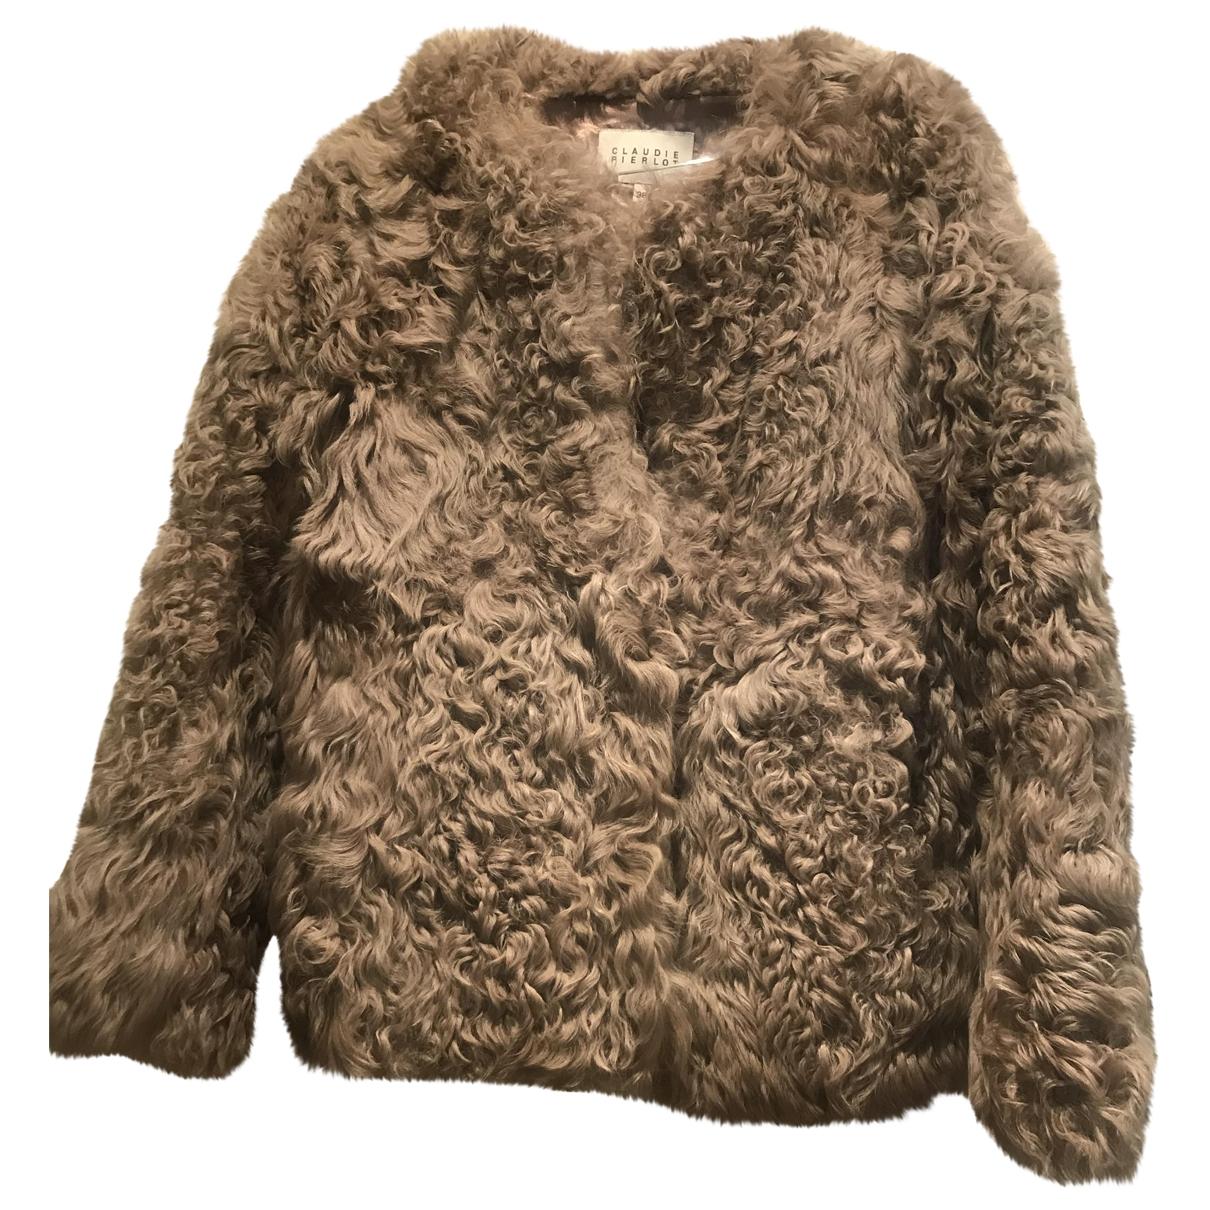 Claudie Pierlot \N Beige Fur coat for Women 38 FR